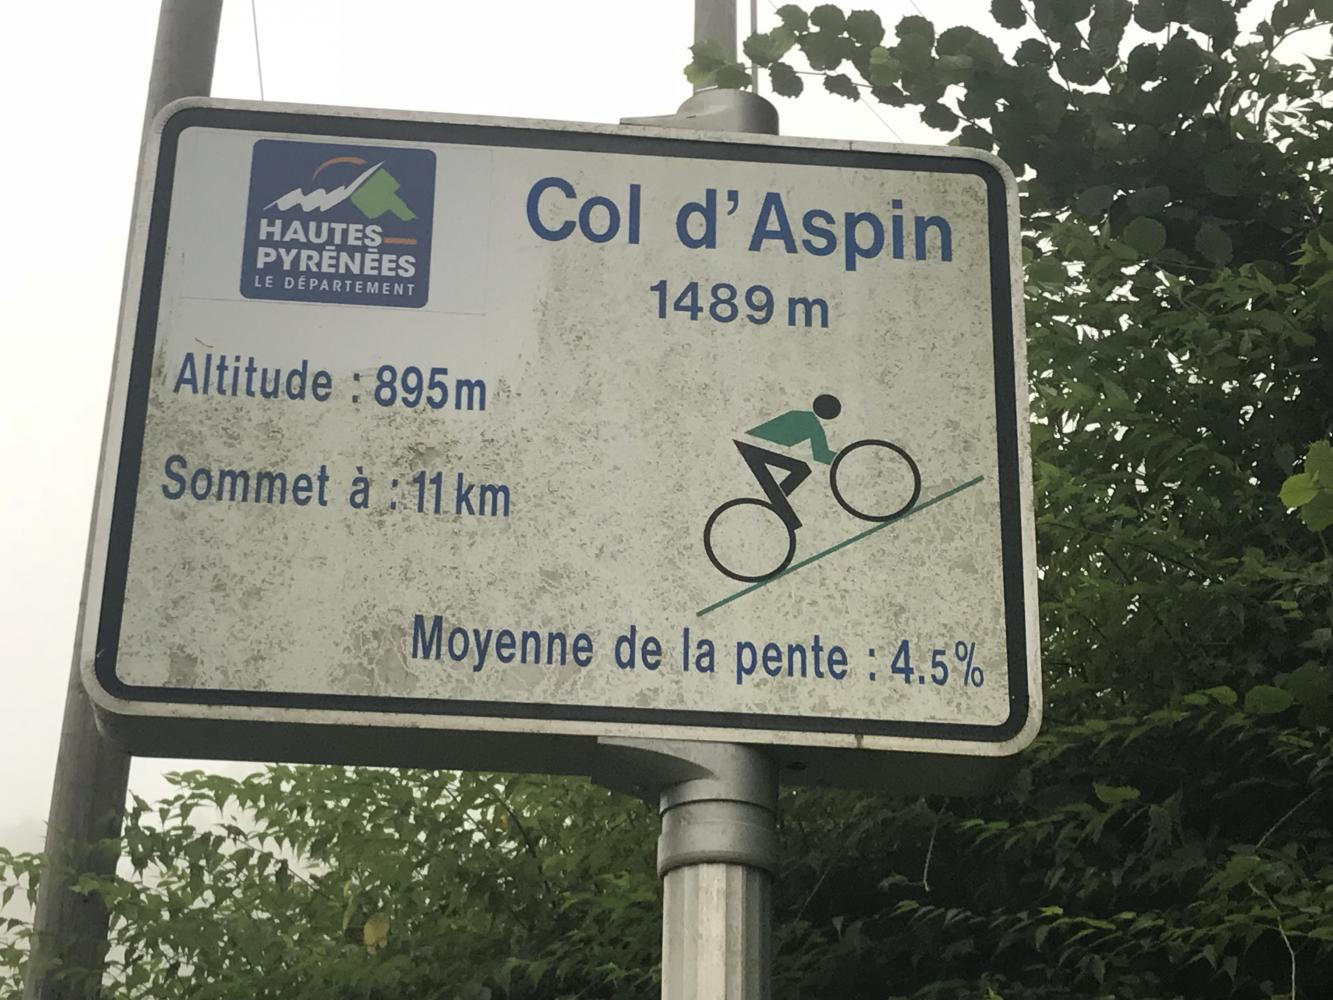 Col d'Aspin - Ste-Marie-de-Campan Bike Climb - PJAMM Cycling